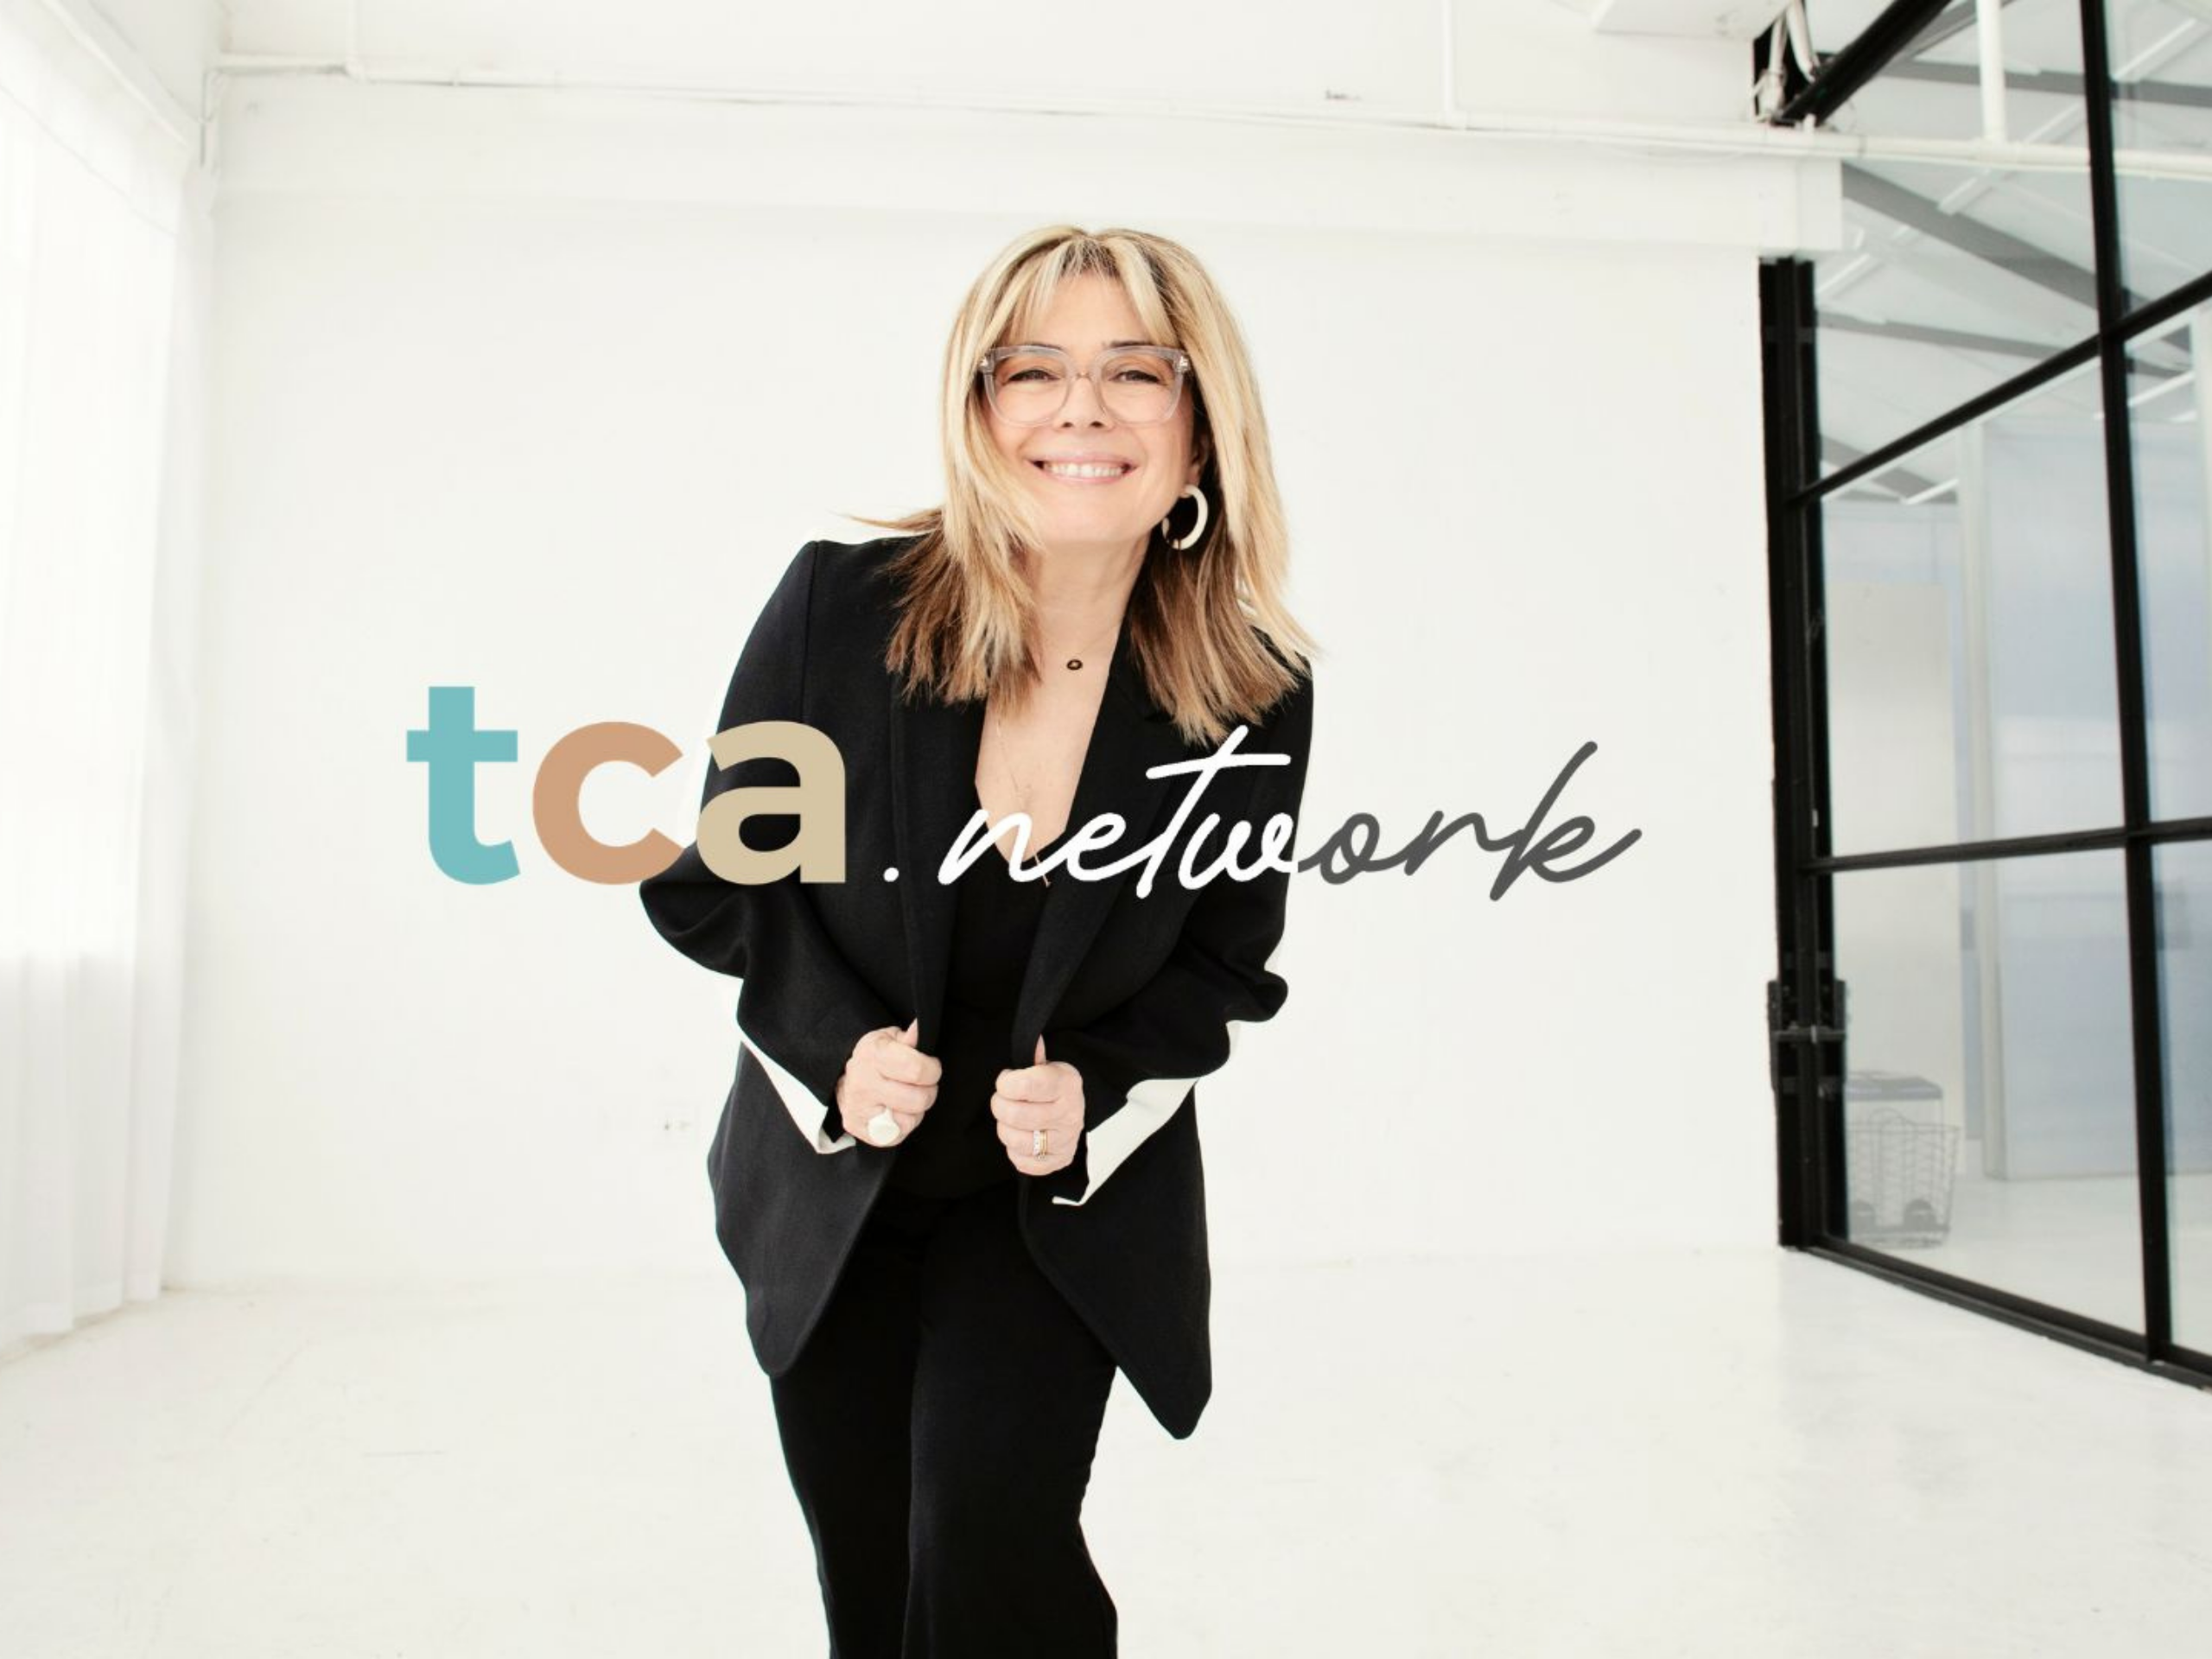 TCA Network